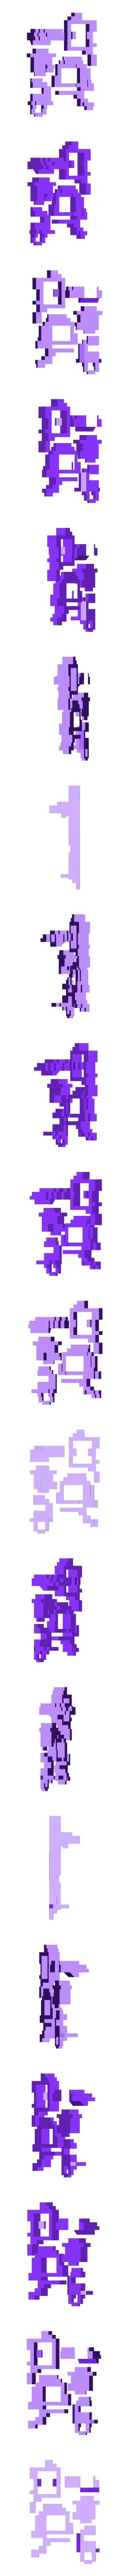 Green_Parts_80.stl Download free STL file 8 bits style Bubble Bobble Dragon - Separate parts (no glue needed) • 3D print model, conceptify